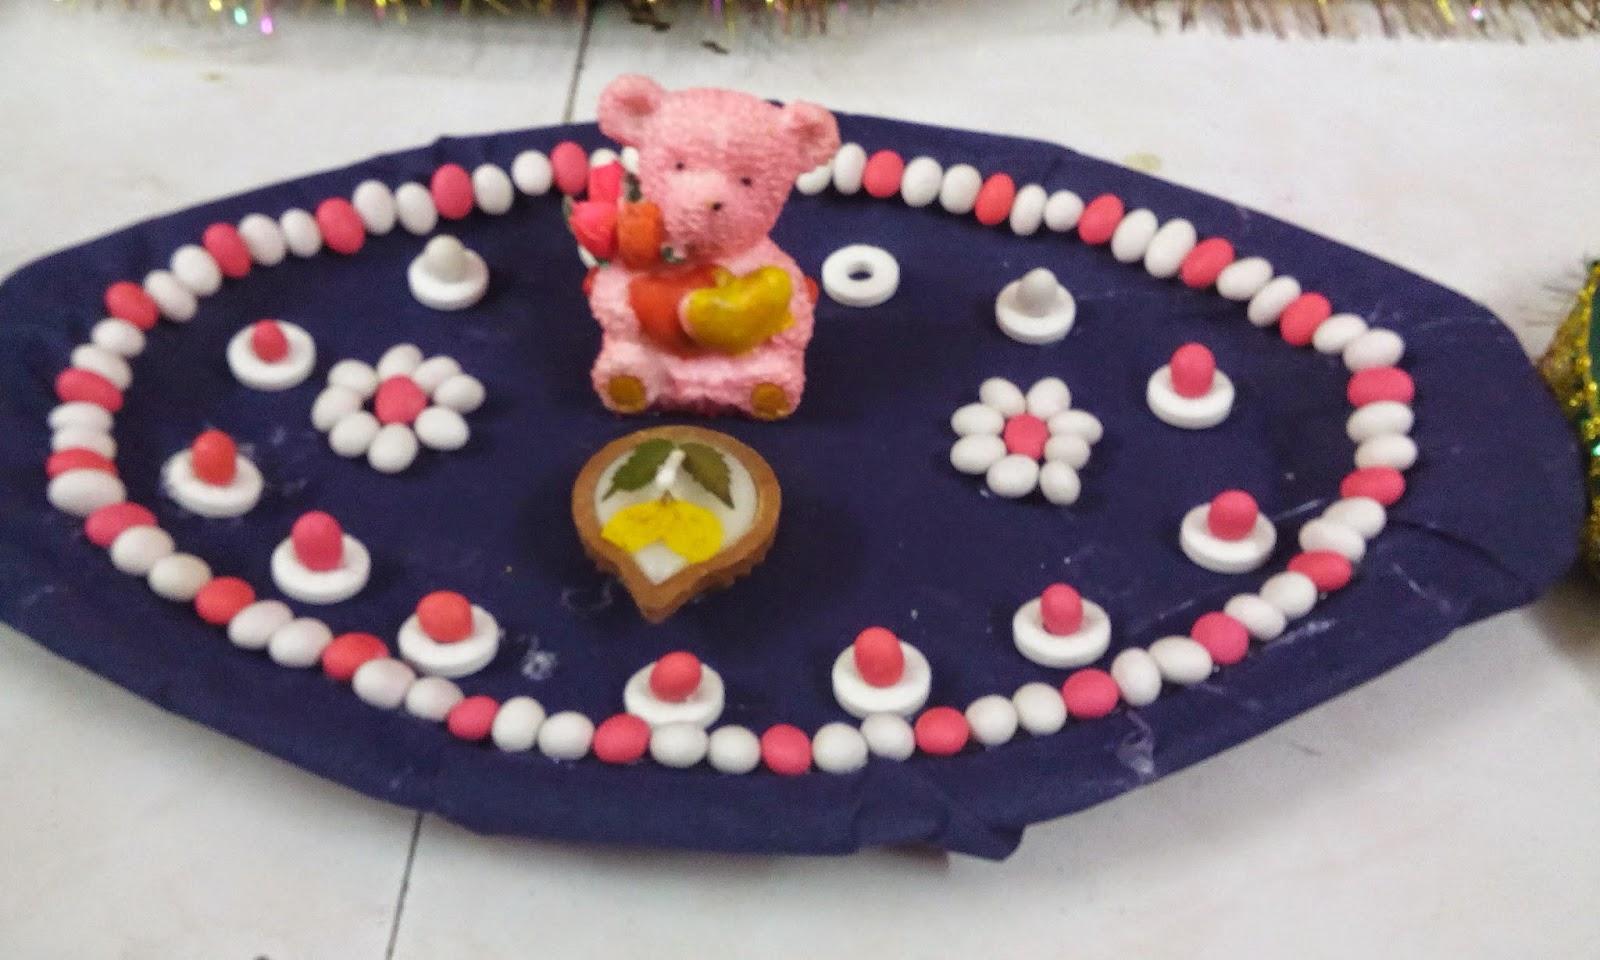 Wedding and Aarthi plates by Chandra Vadhana